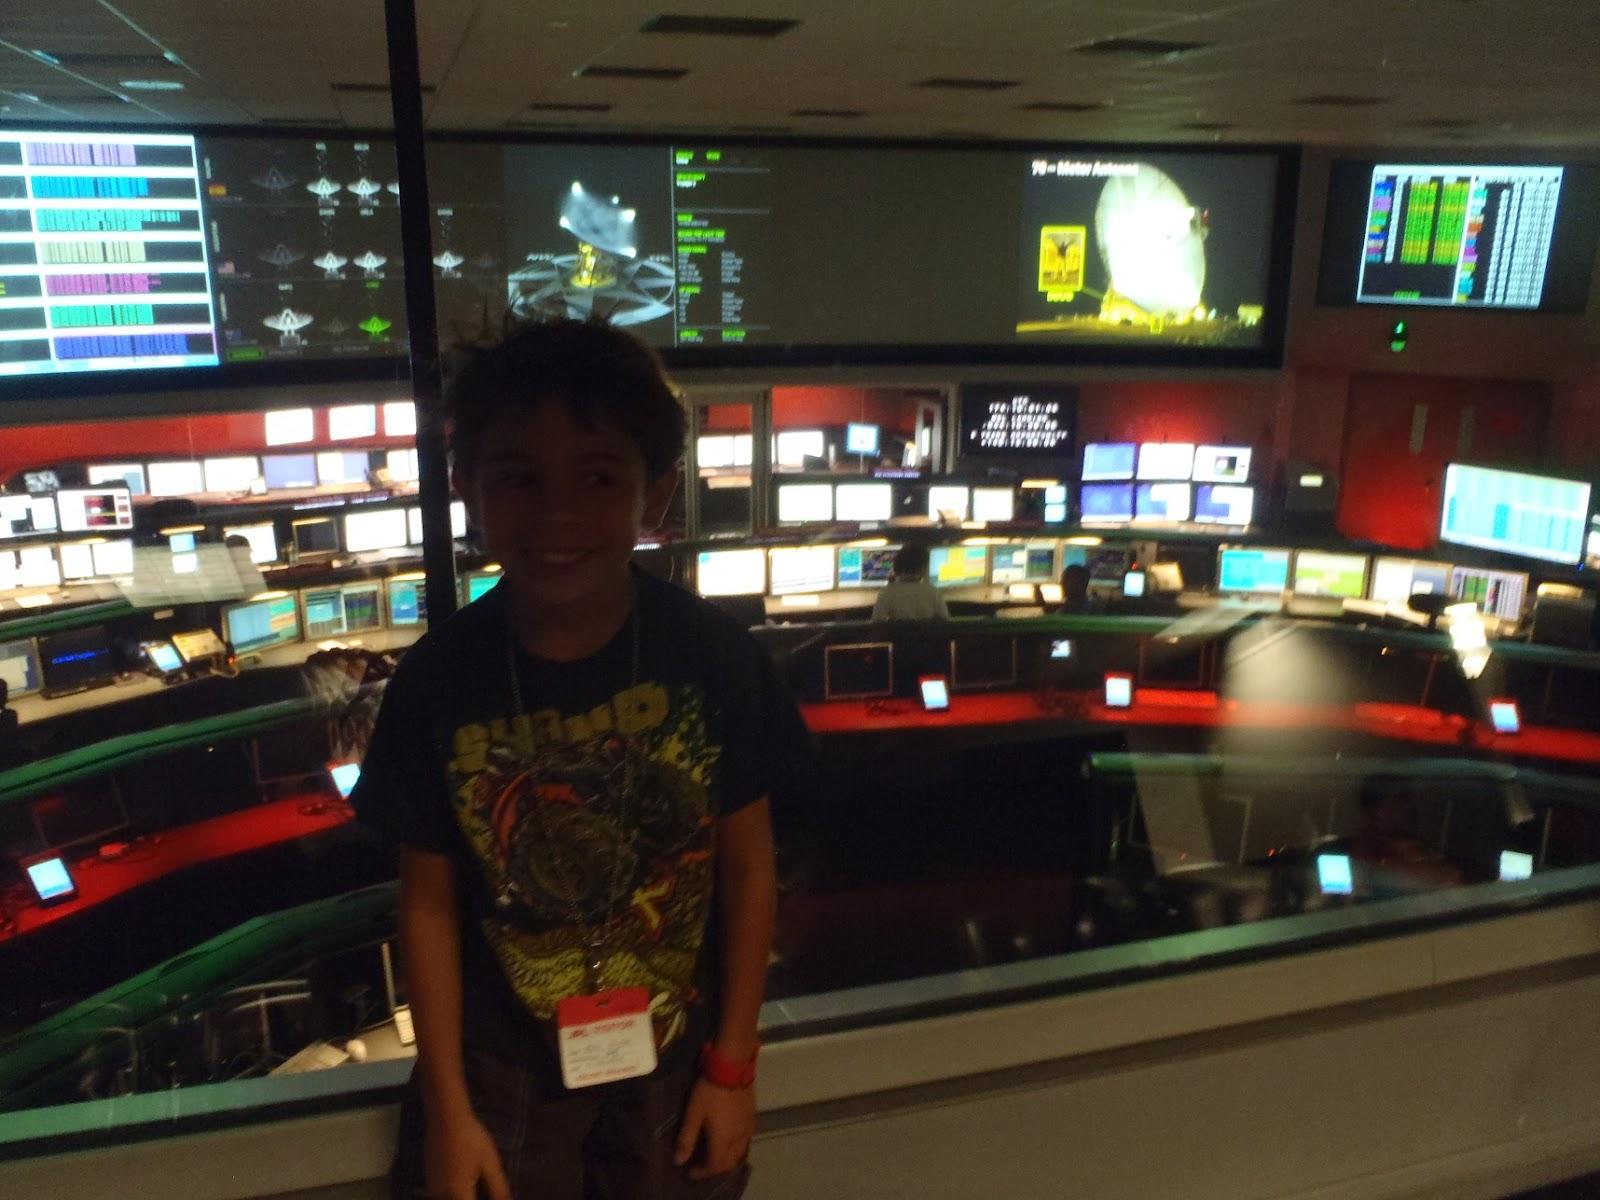 mars rover control room - photo #32